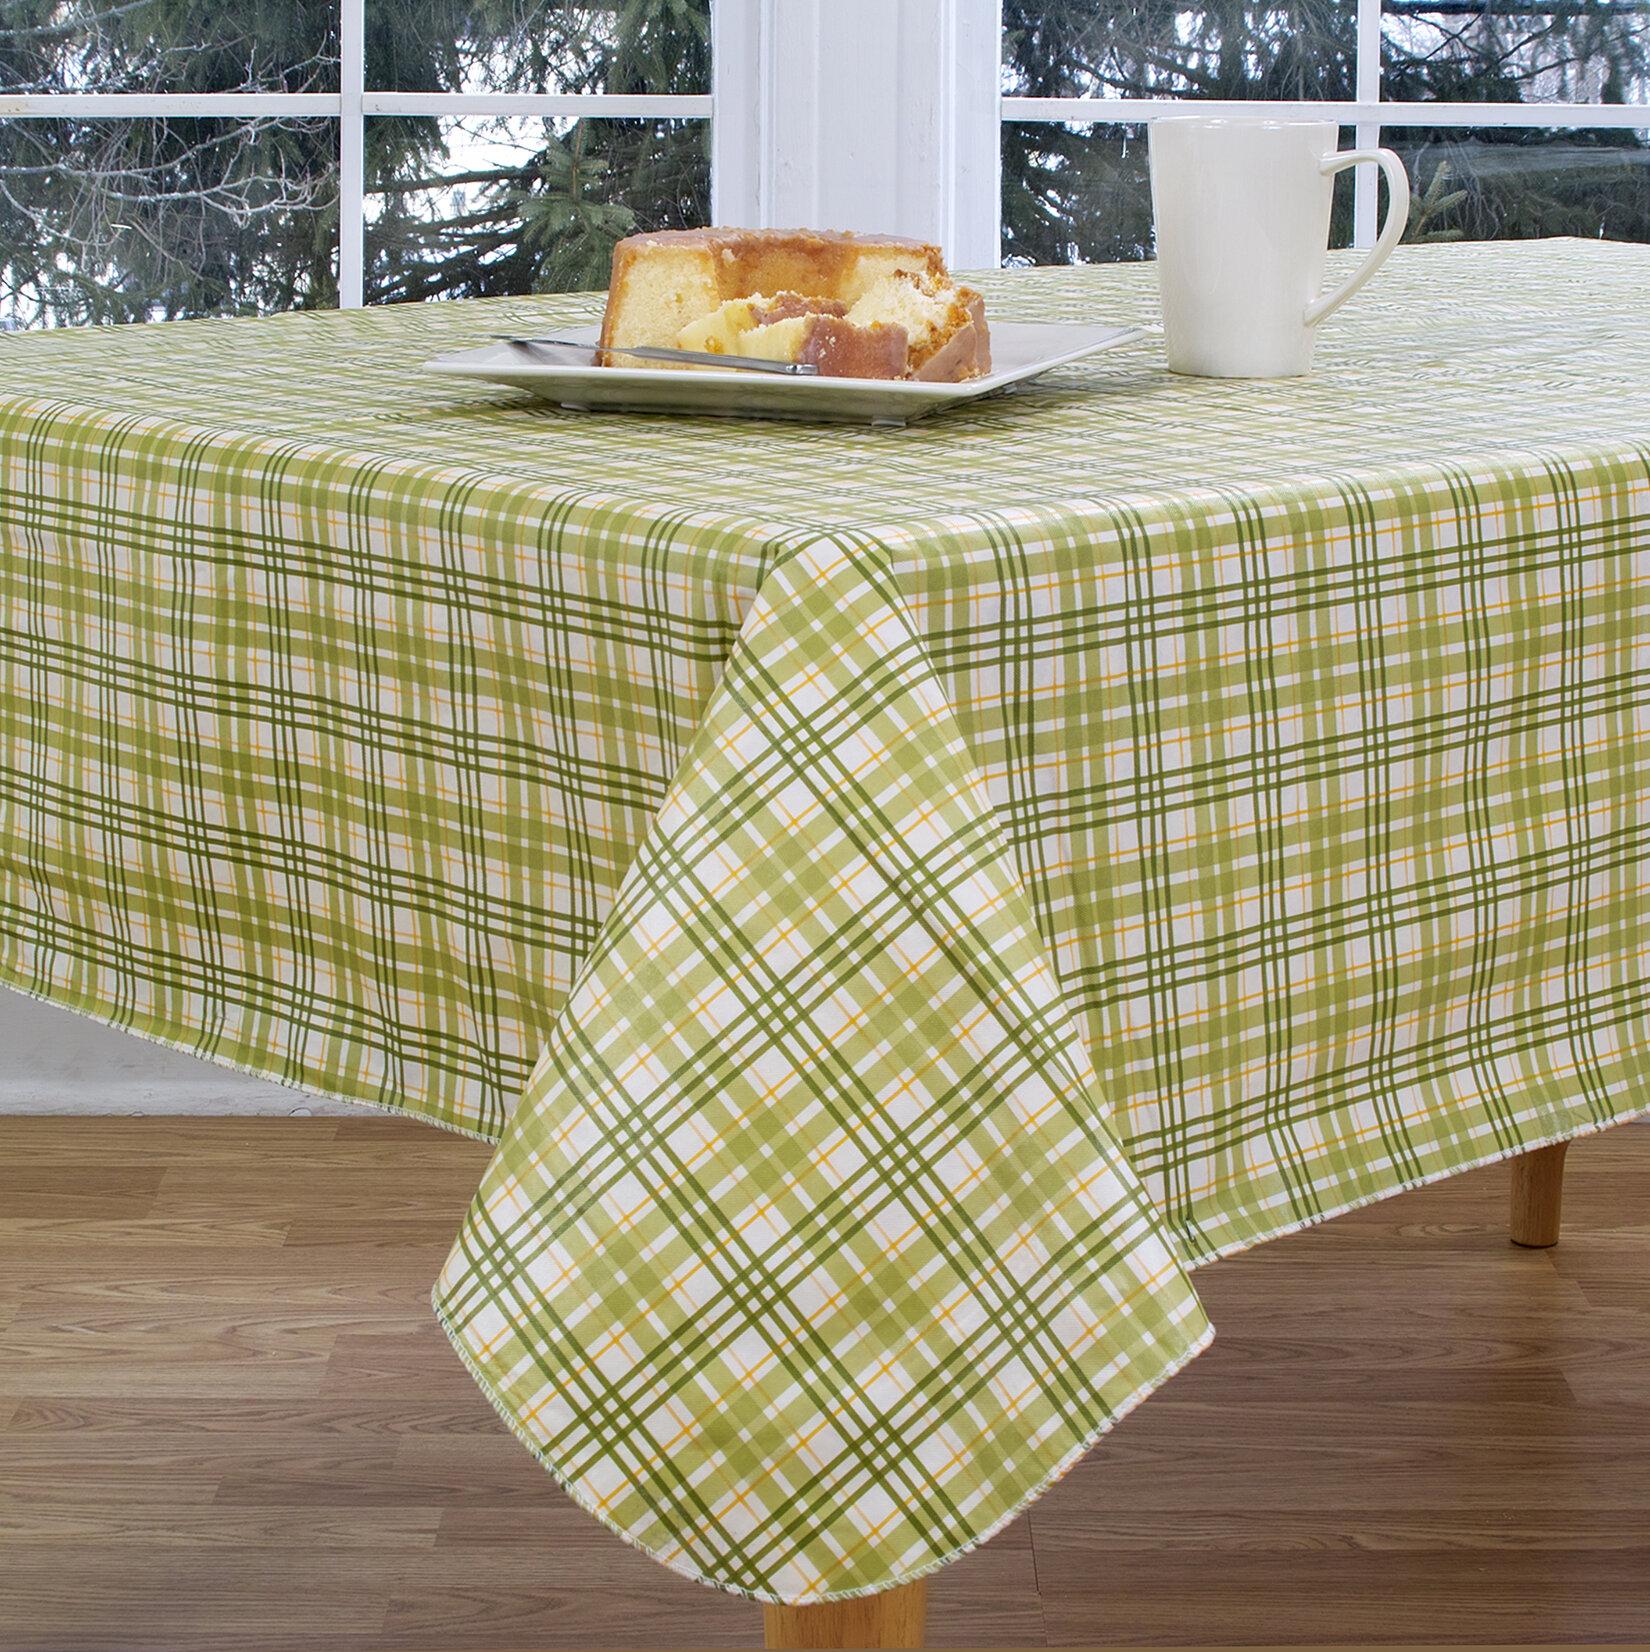 The Holiday Aisle Homestead Plaid Vinyl Tablecloth U0026 Reviews | Wayfair